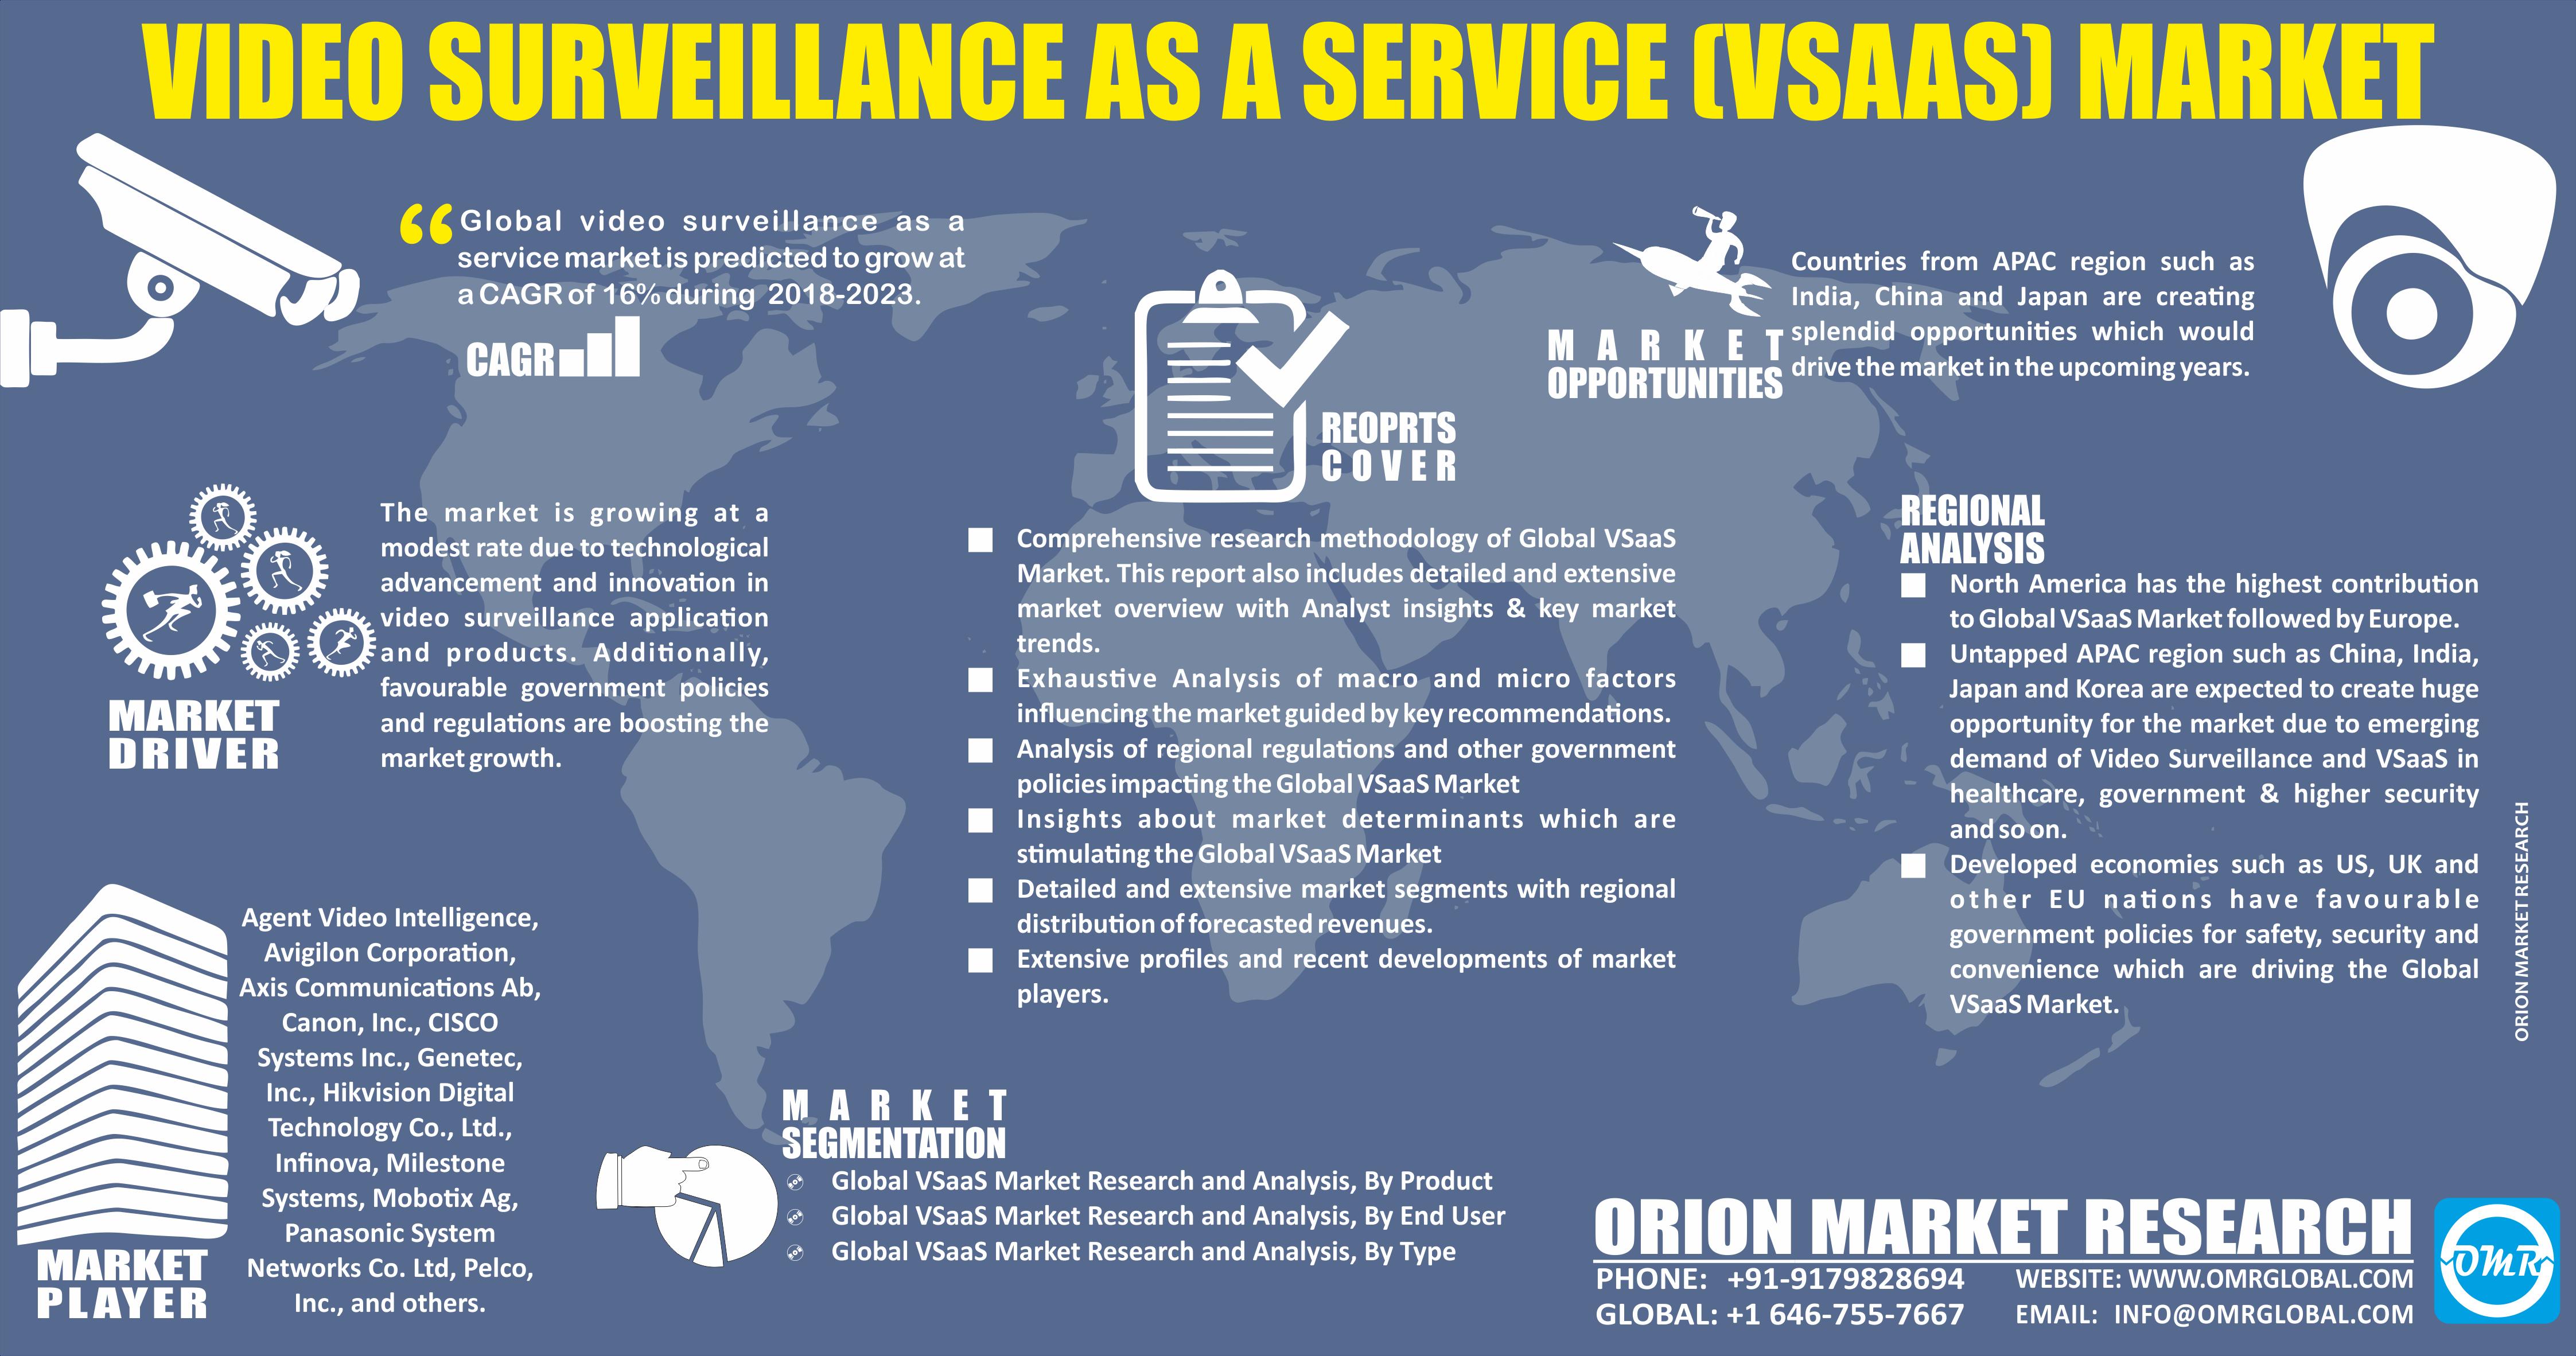 Video Surveillance as a Service Market Size, Share ICT